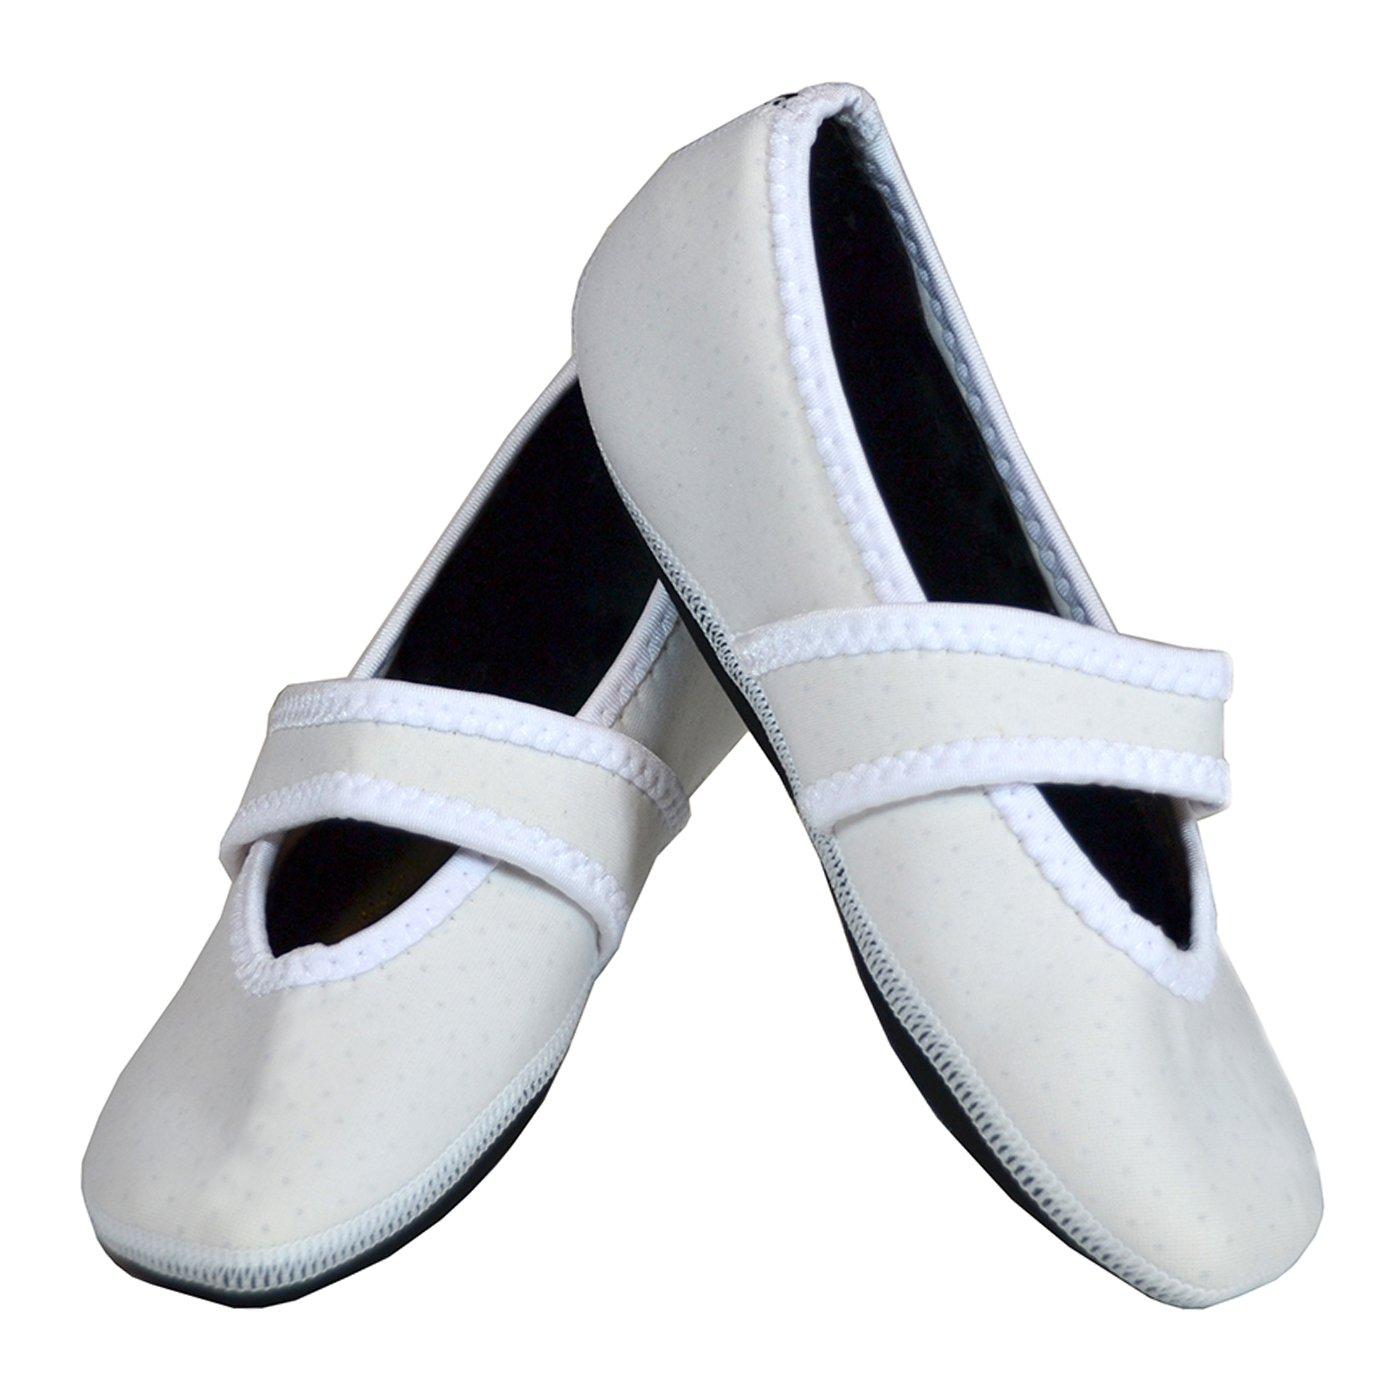 Nufoot Betsy Lou Women's Shoes, Best Foldable & Flexible Flats, Slipper Socks, Travel Slippers & Exercise Shoes, Dance Shoes, Yoga Socks, House Shoes, Indoor Slippers, White, X-Large